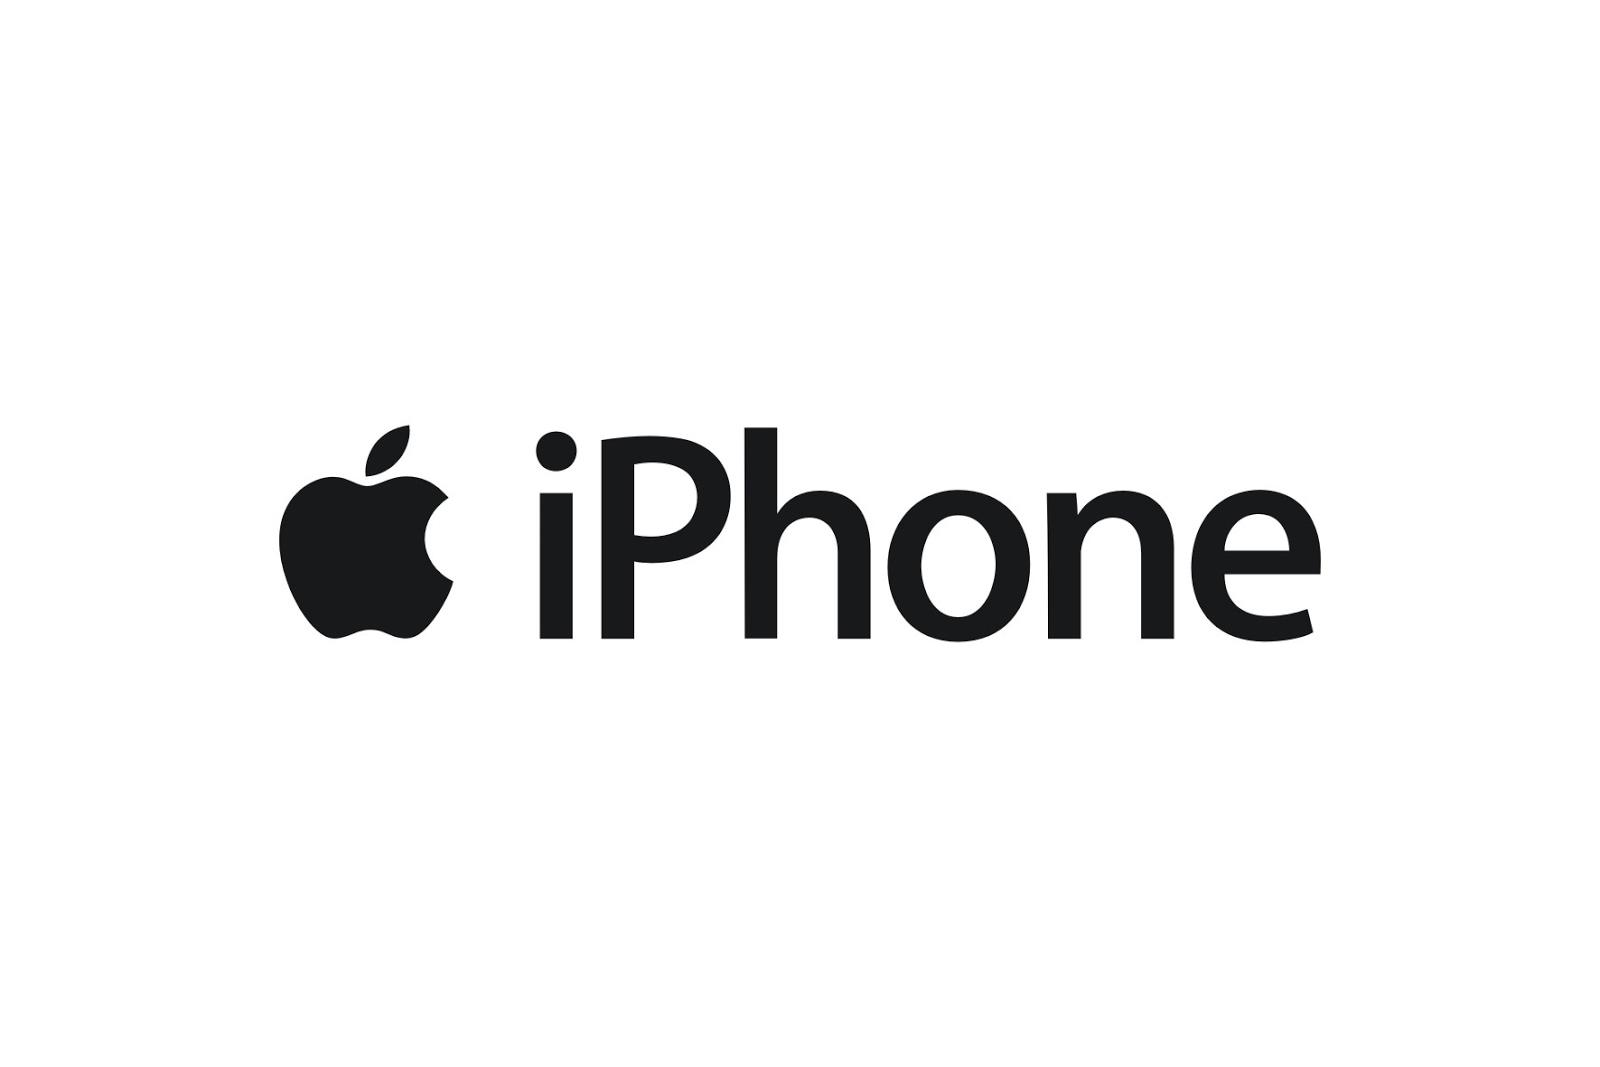 apple reveals iphone 5c and iphone 5s teachmeios com rh teachmeios com iphone logo font type iphone 7 logo font